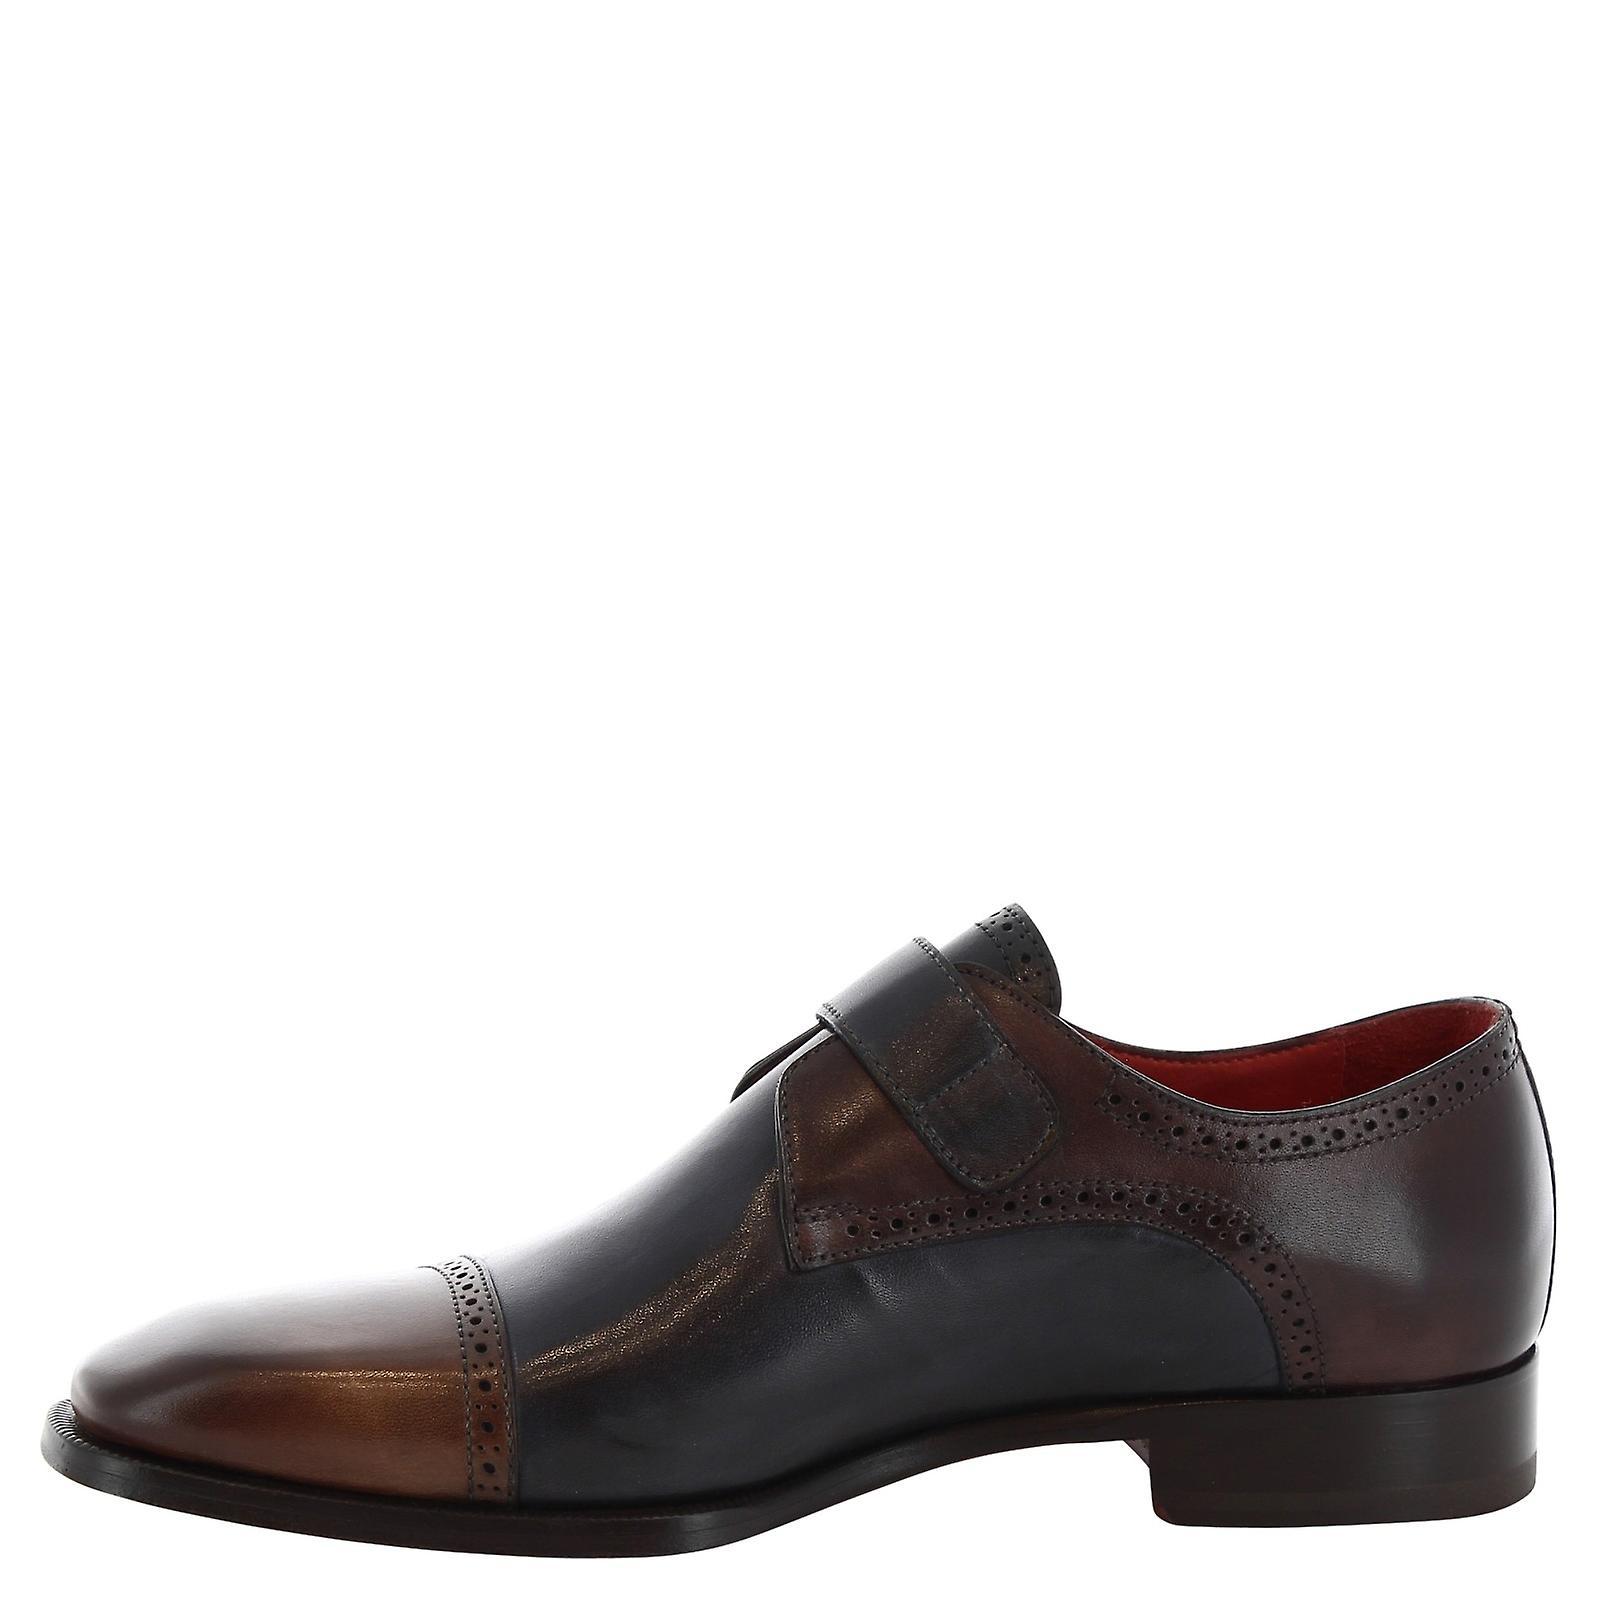 Leonardo Shoes 8737e19tomvitellodelavebrandy Men's Blue Leather Monk Strap Shoes 176IKW